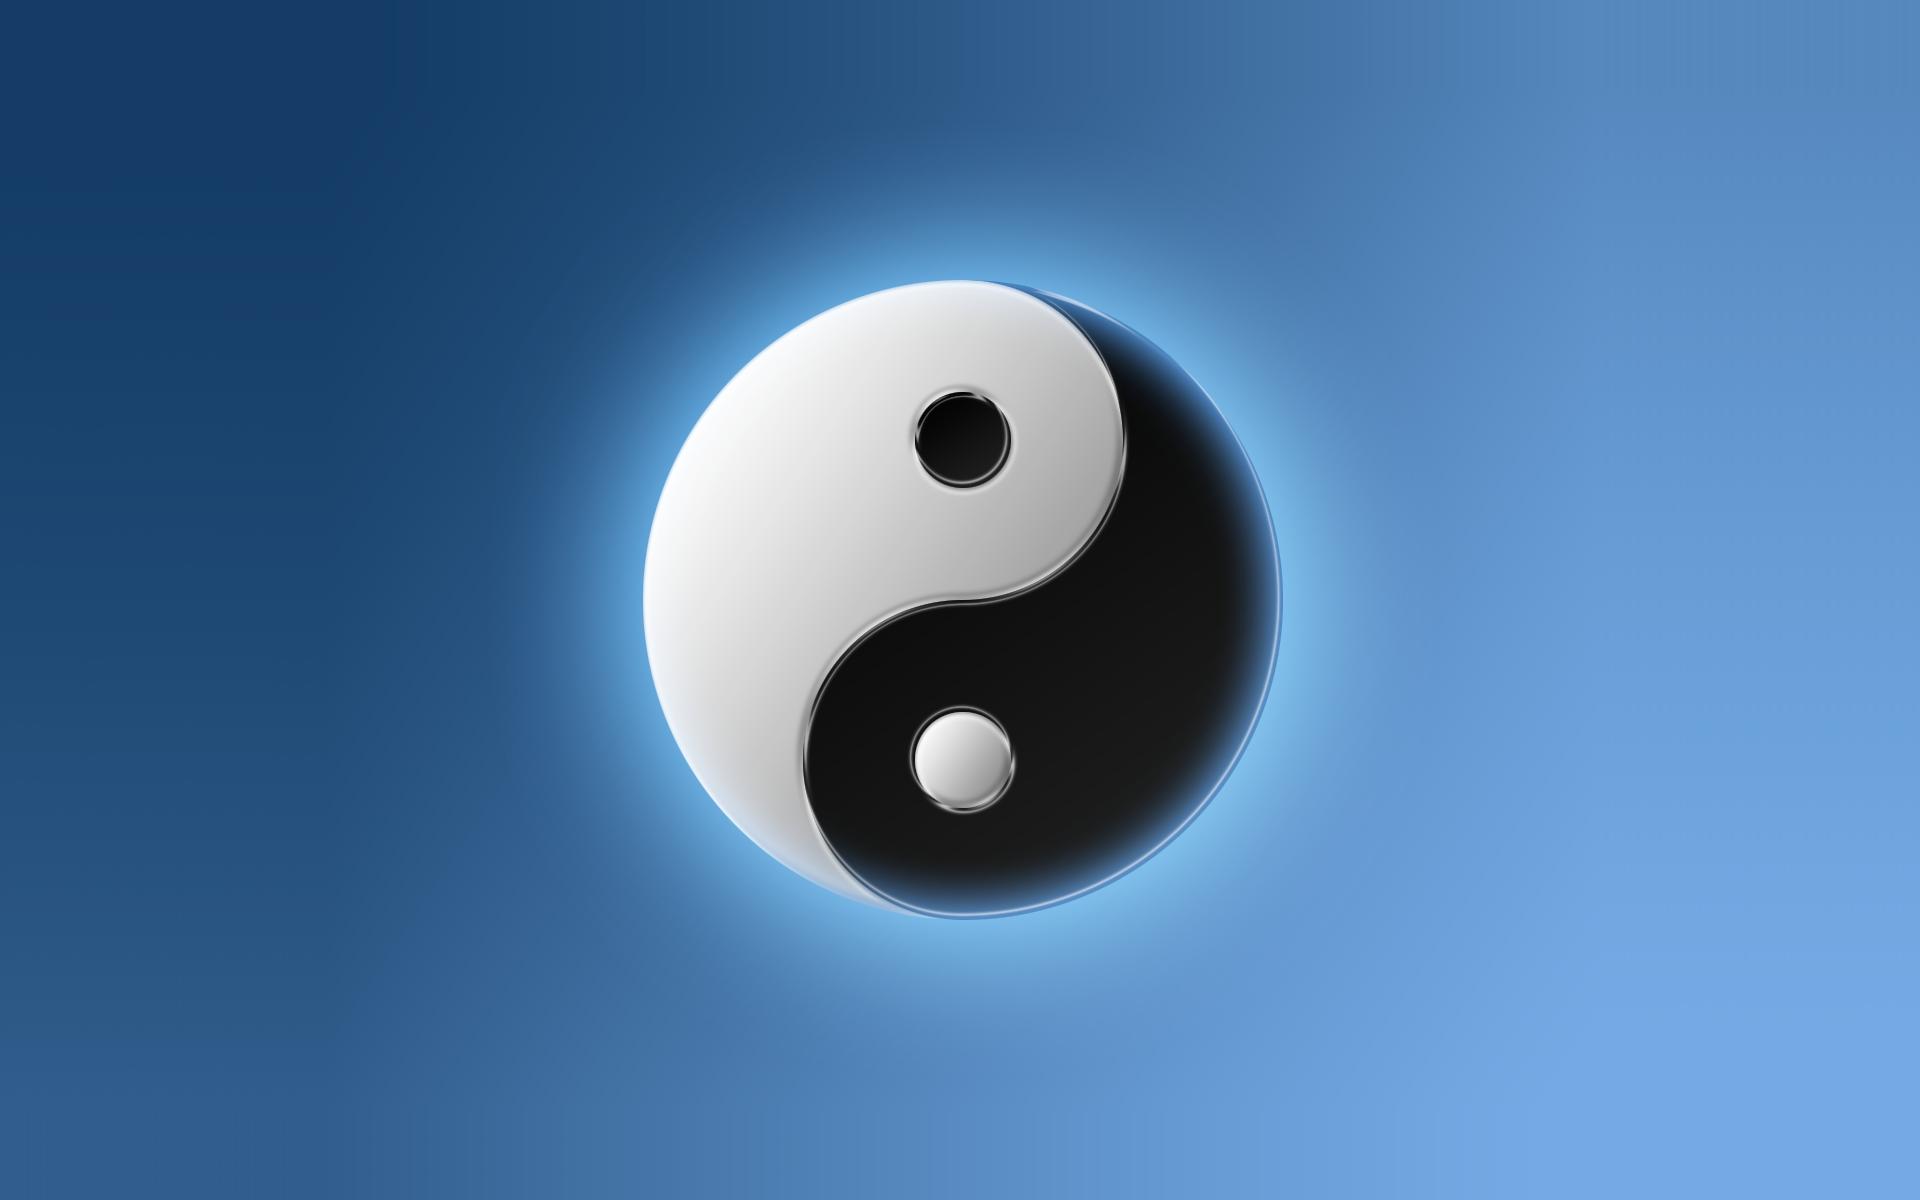 Iphone wallpaper tumblr yin yang - Yin Yang Wallpapers Wallpaper Cave